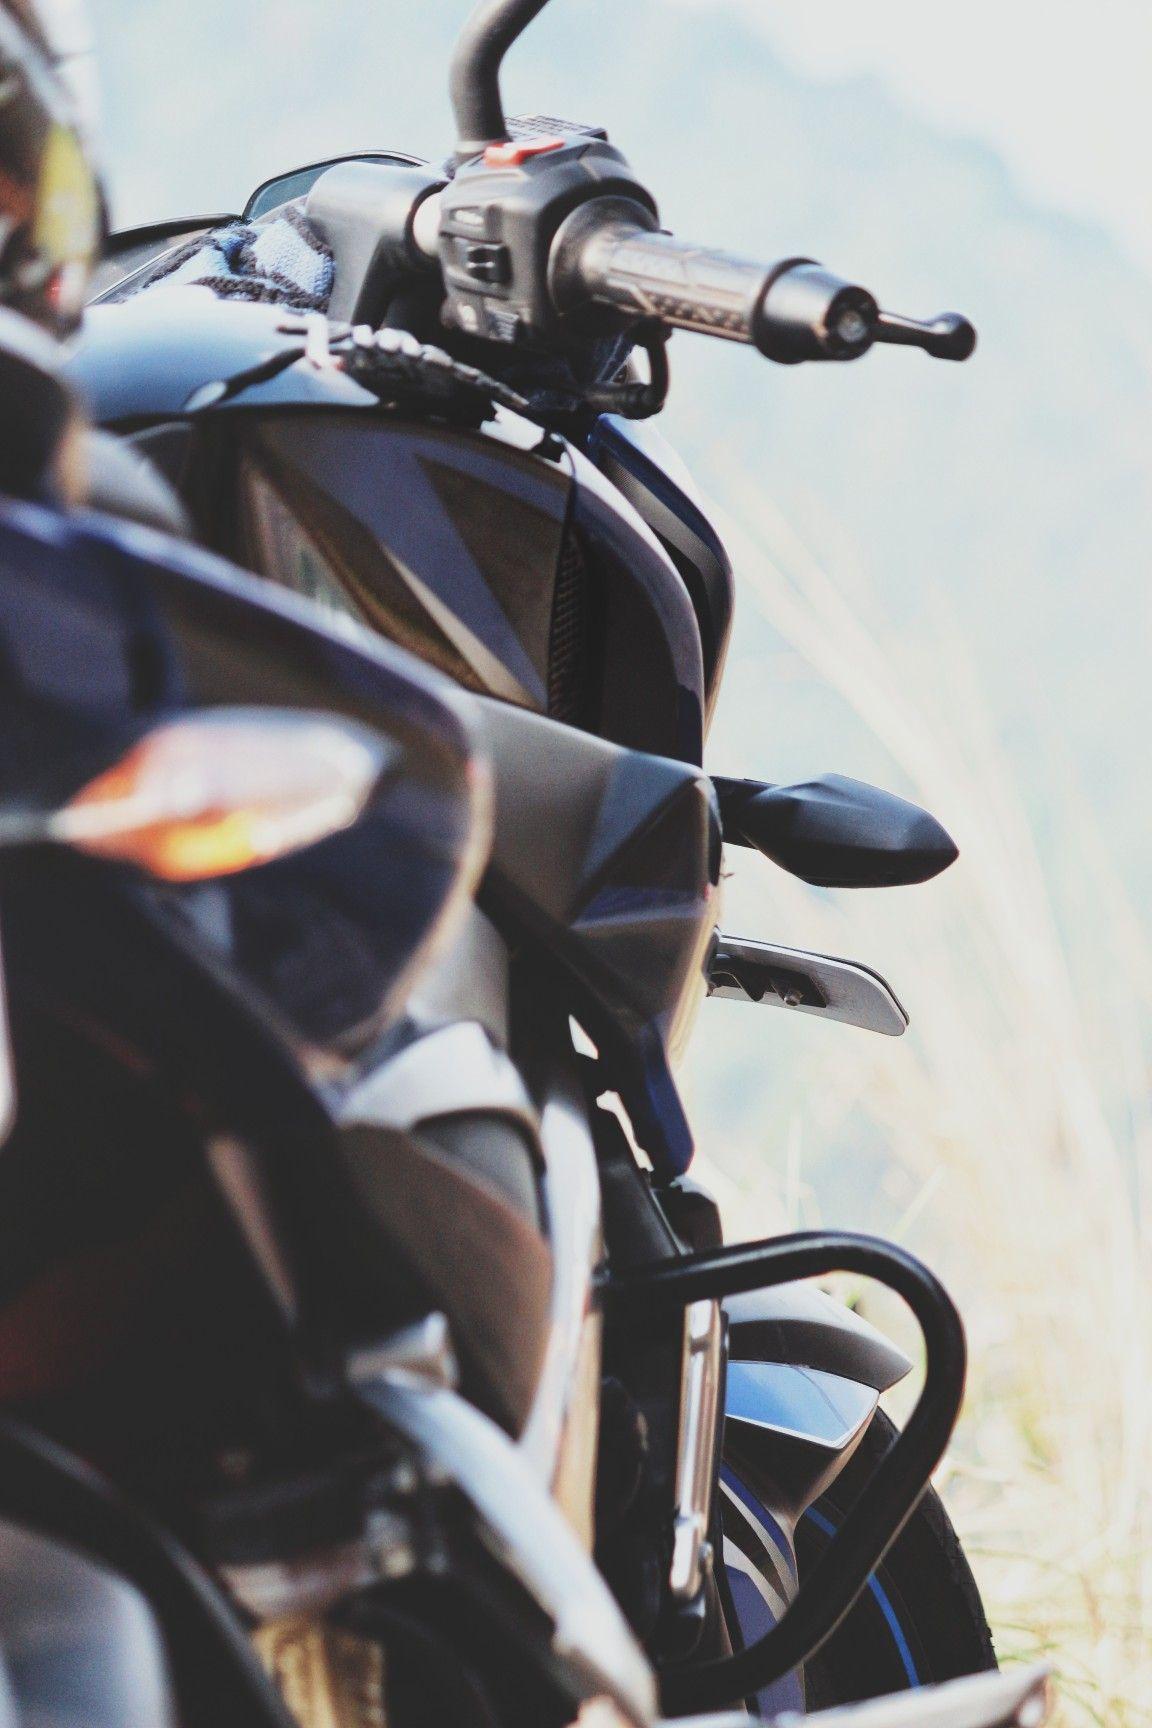 Ns 200 Wallpaper Bike Poster Bike Photography Bike